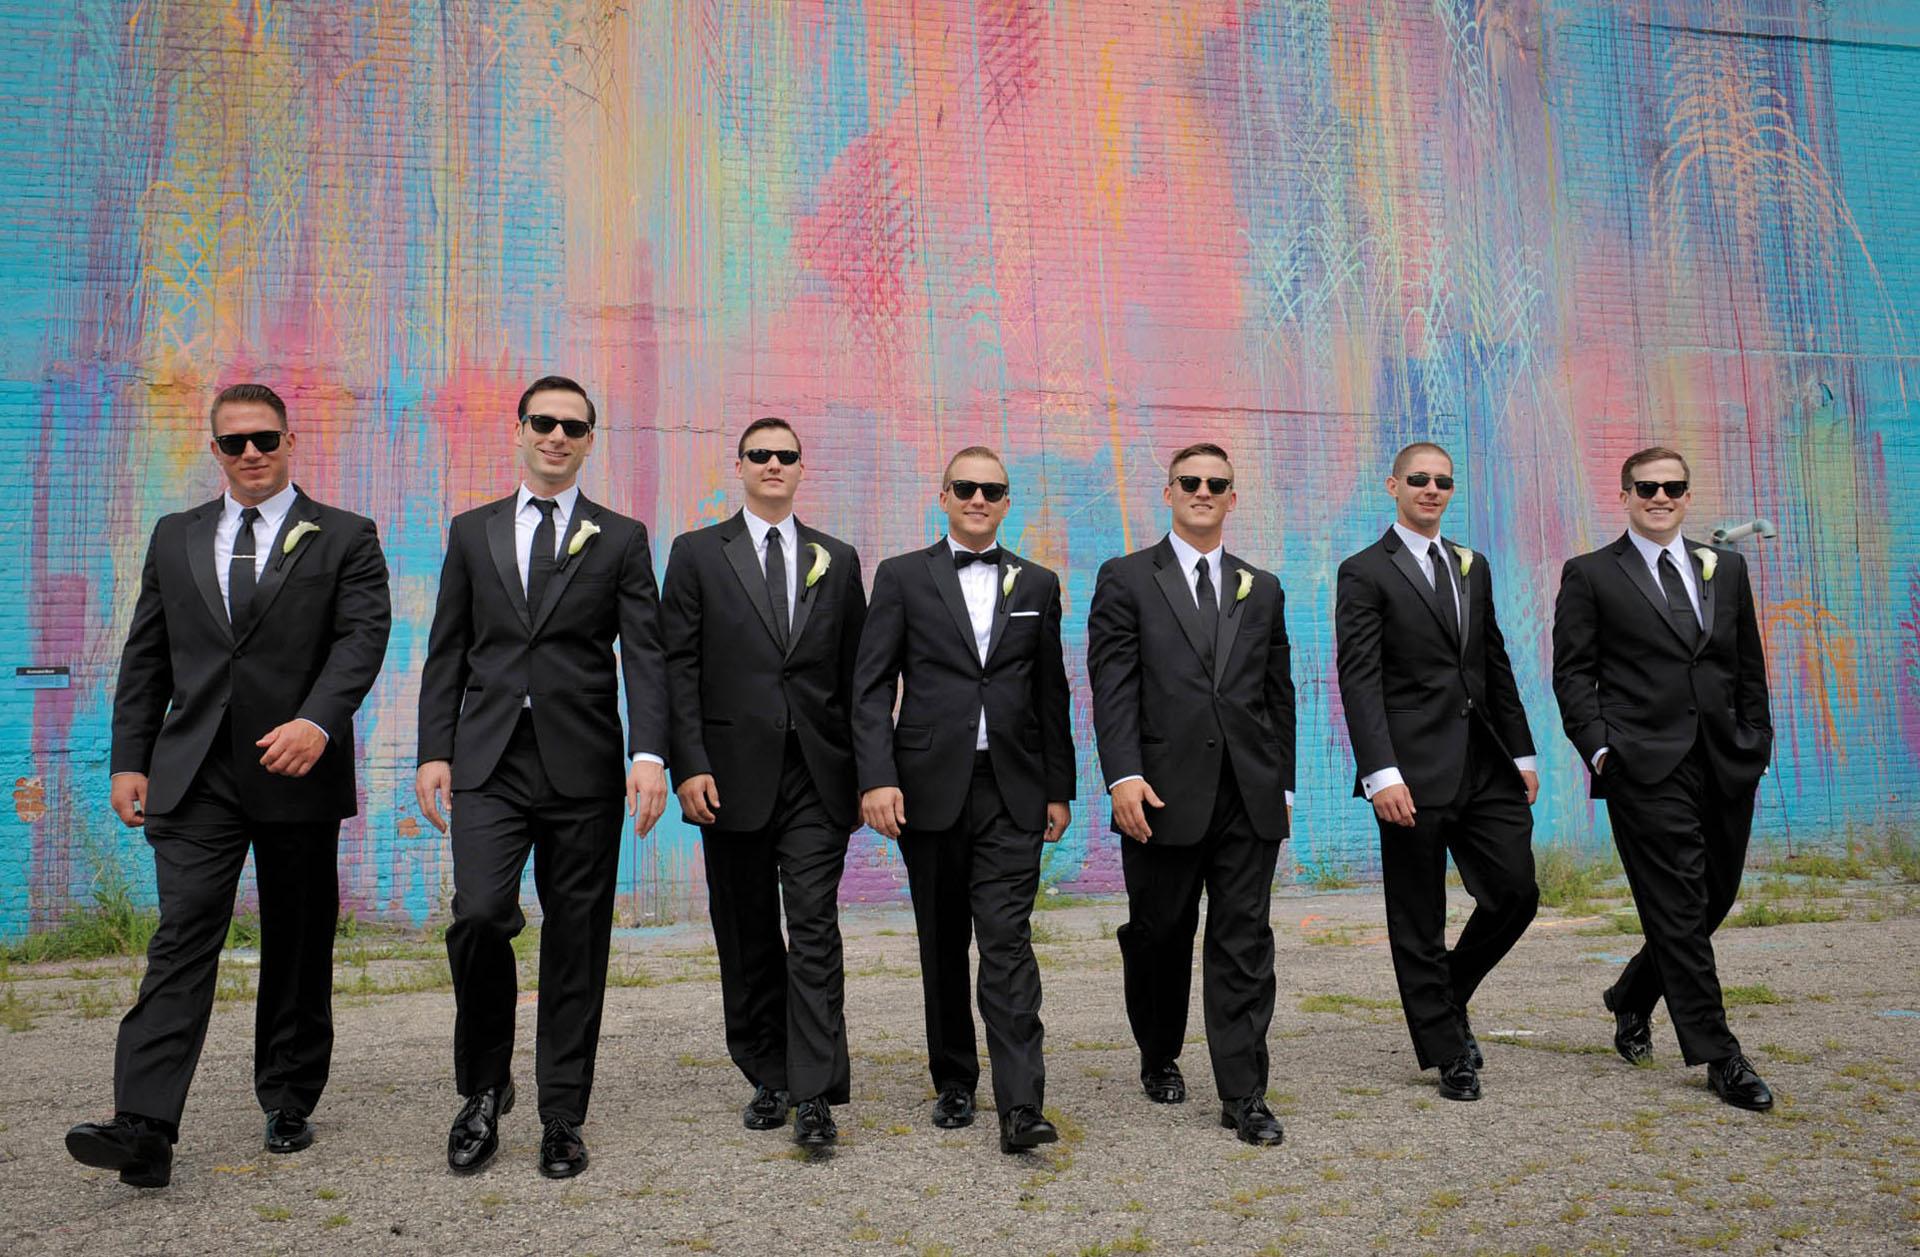 Groom and groomsmen do the walk away from the bleeding rainbow in Detroit, Michigan.